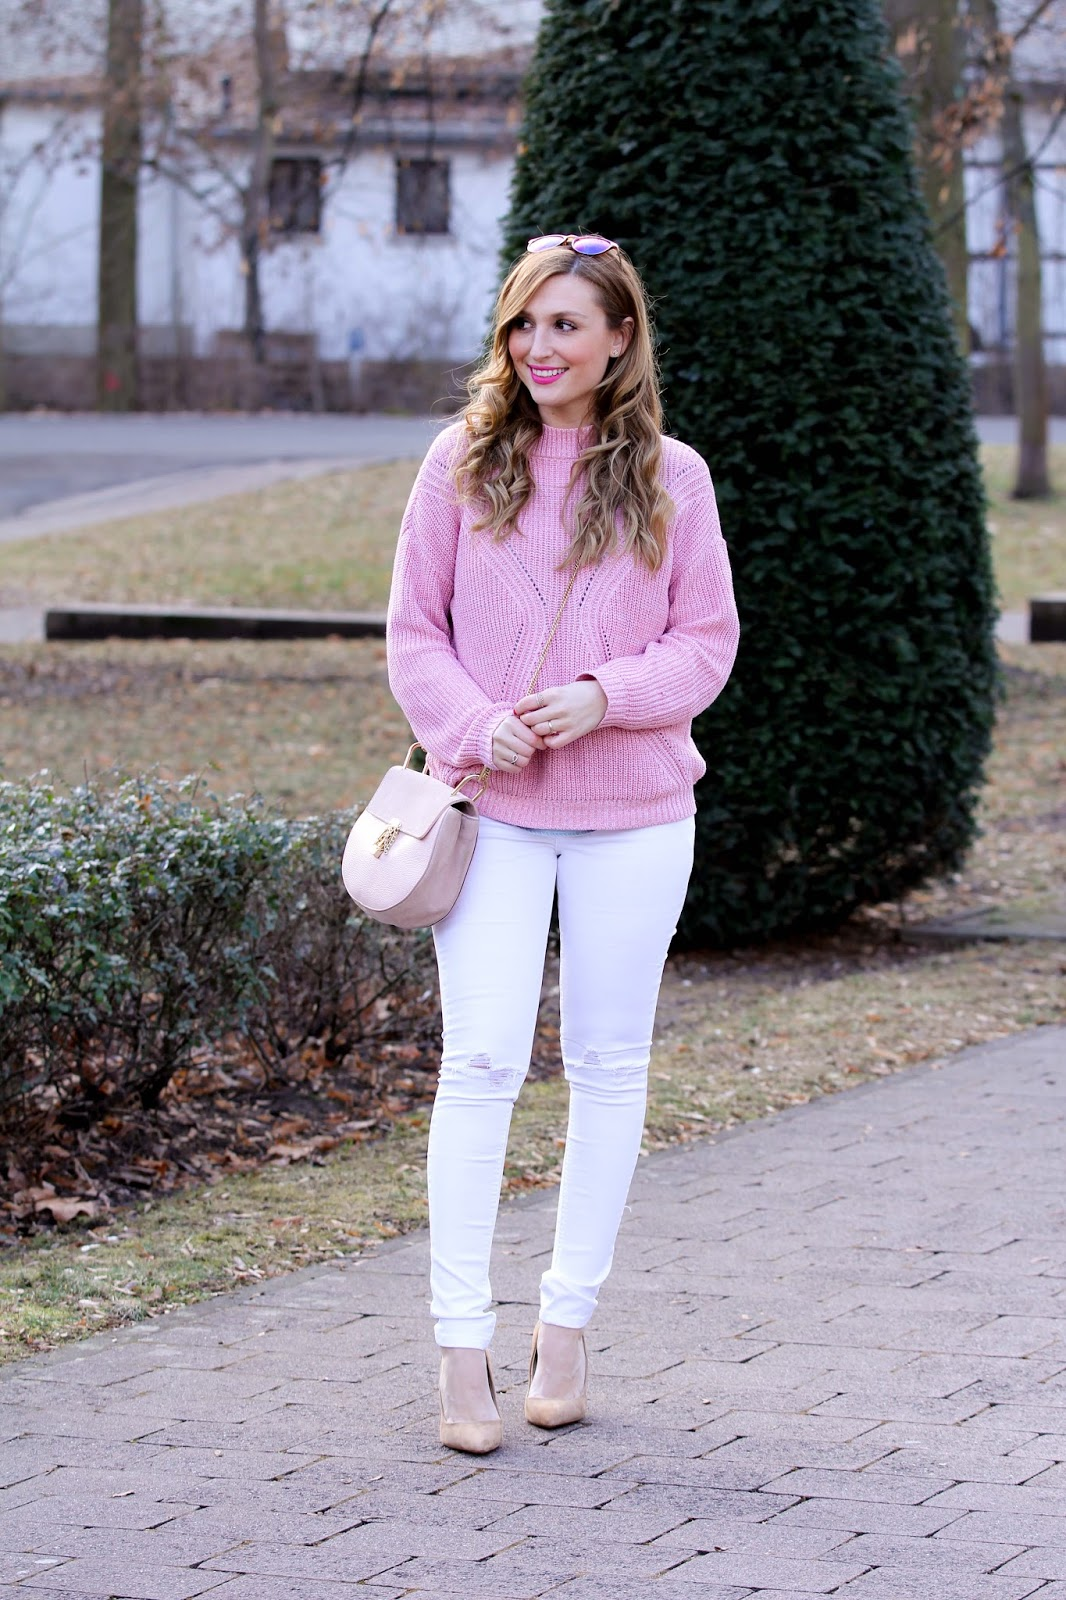 Schwarze-overknees-stuart-weitzman-Blogger-aus-Frankfurt-Outdoorblogger-Fashionstylebyjohanna-rosa-rock-